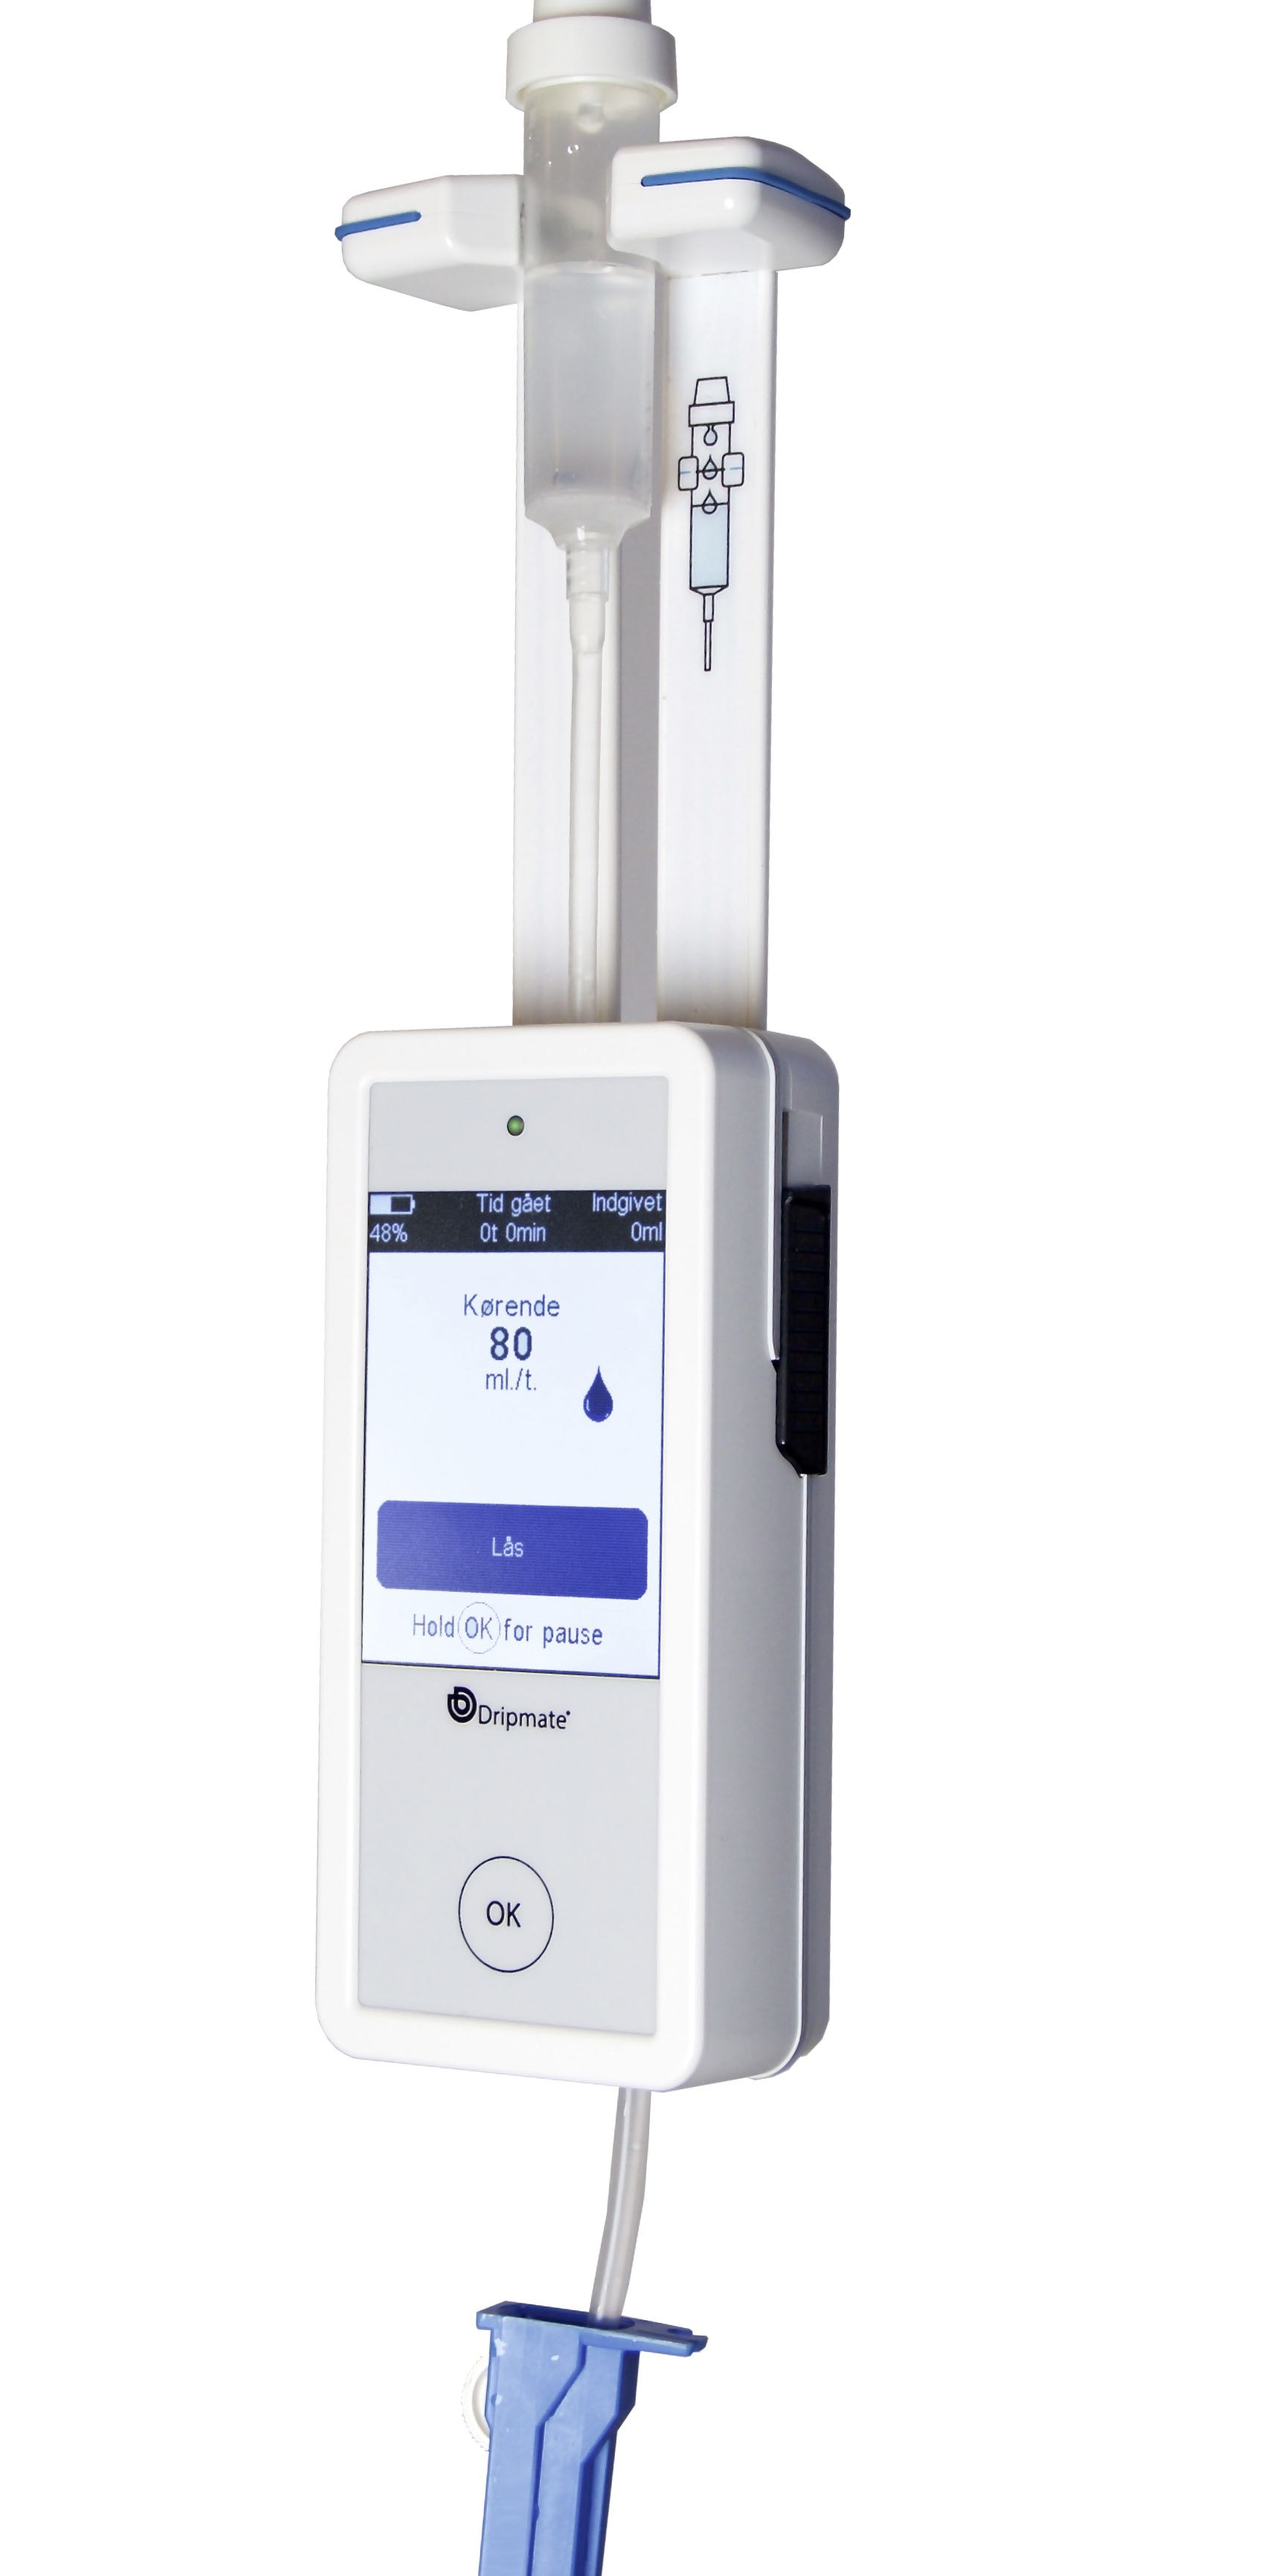 Dripmate - Medical Device